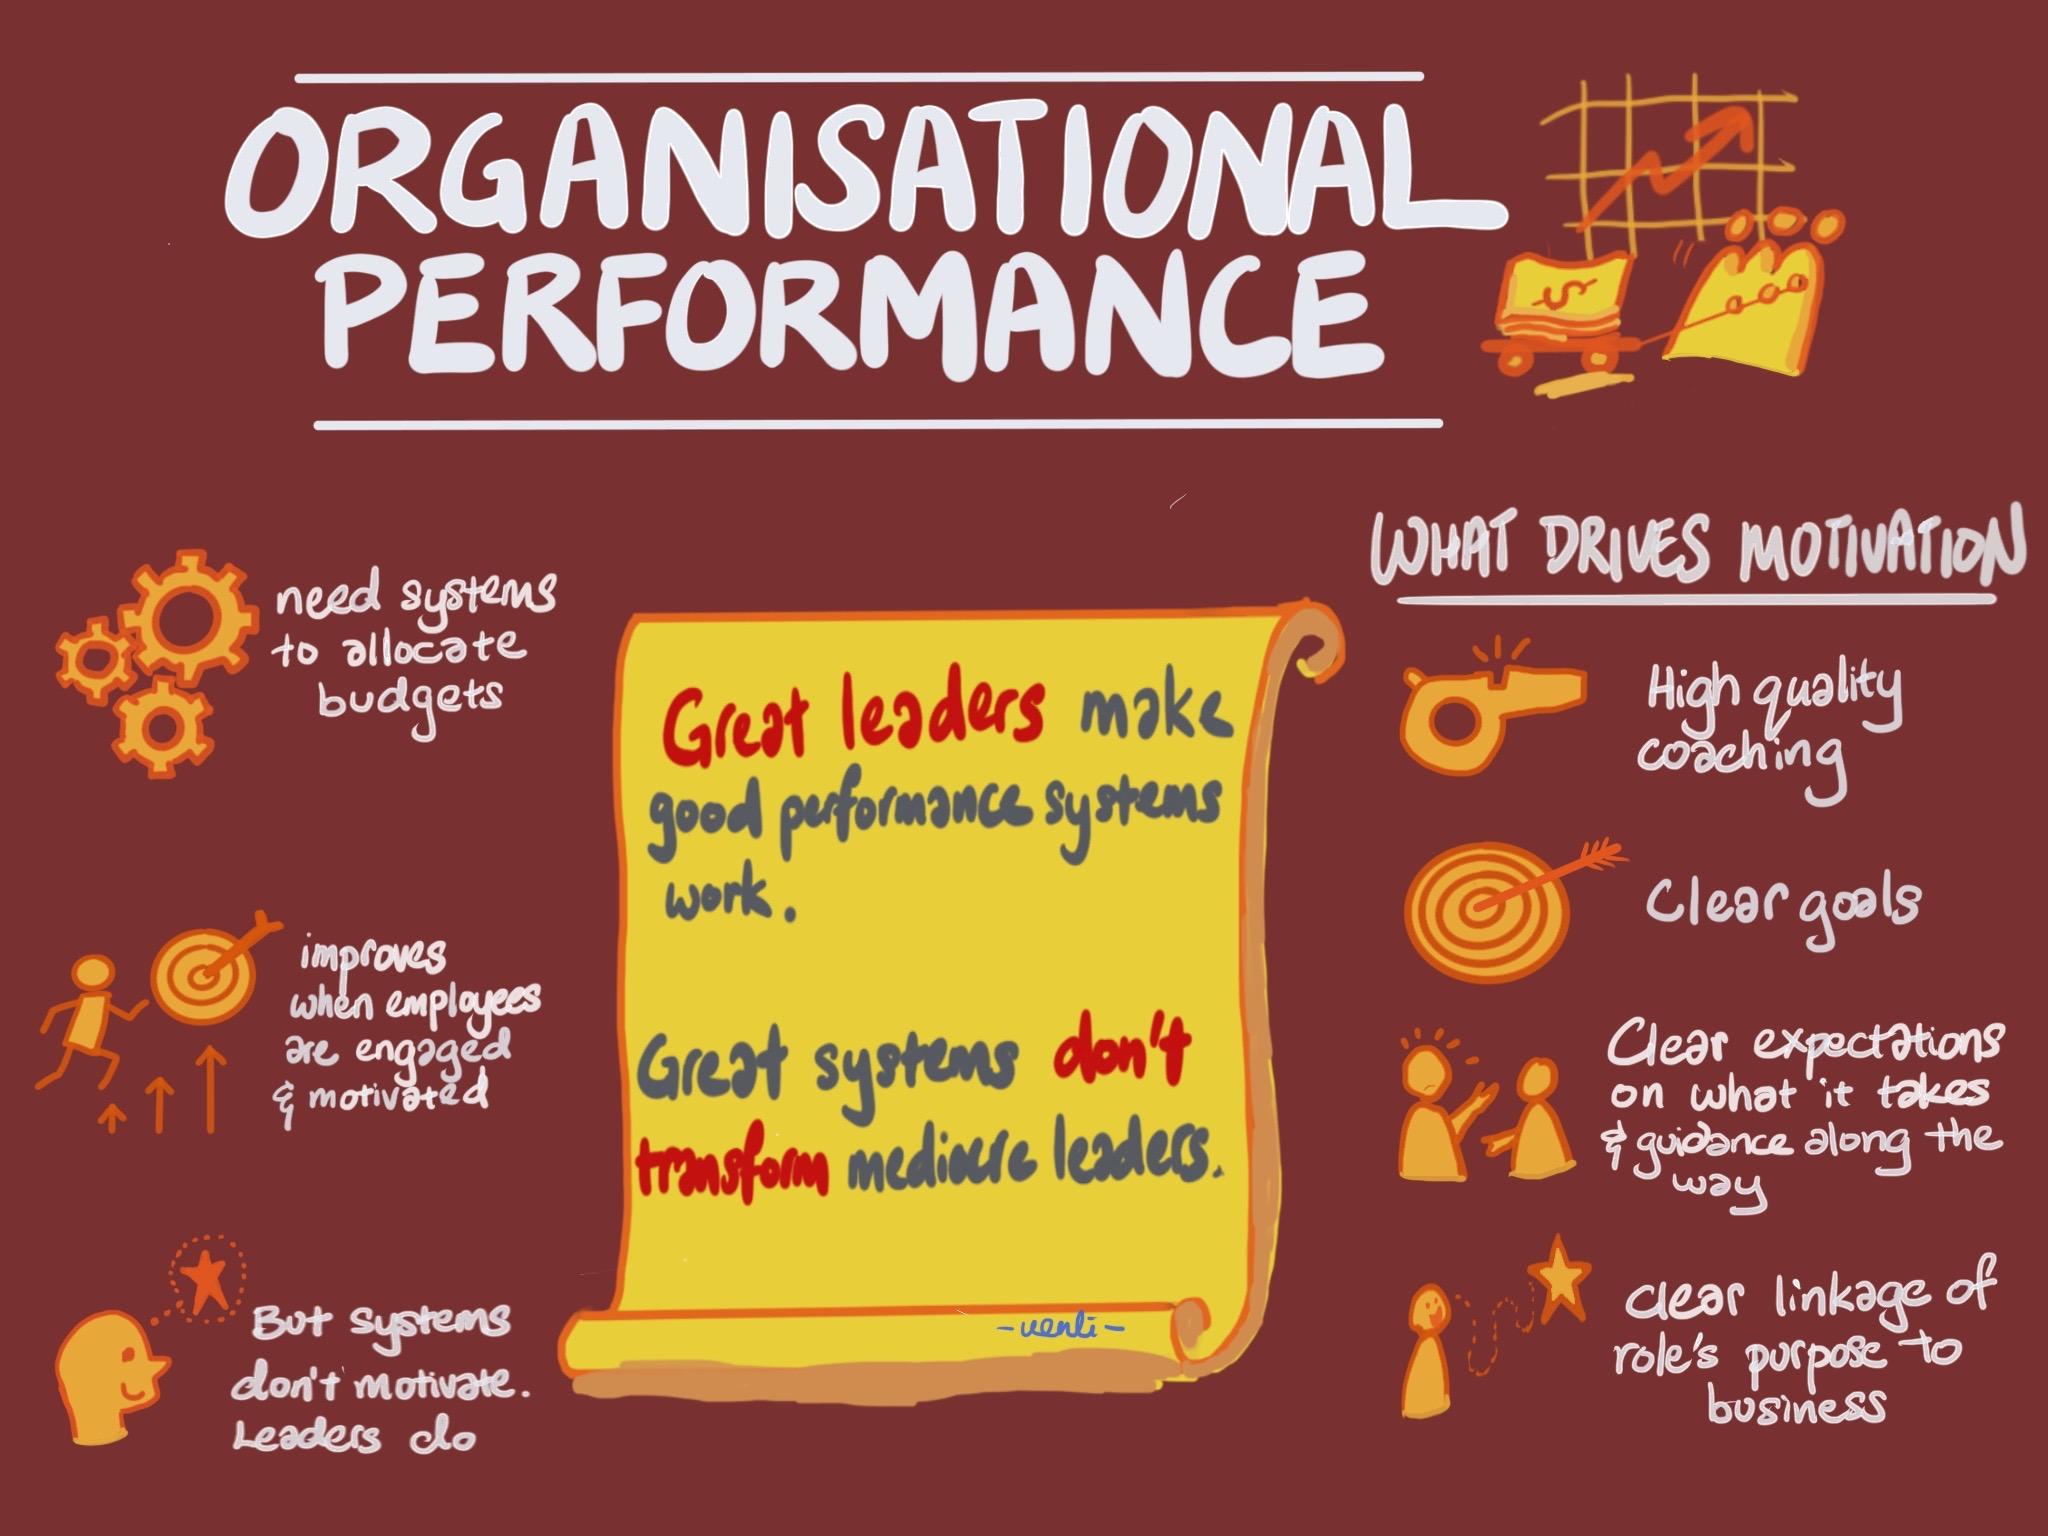 Organisational Performance Image